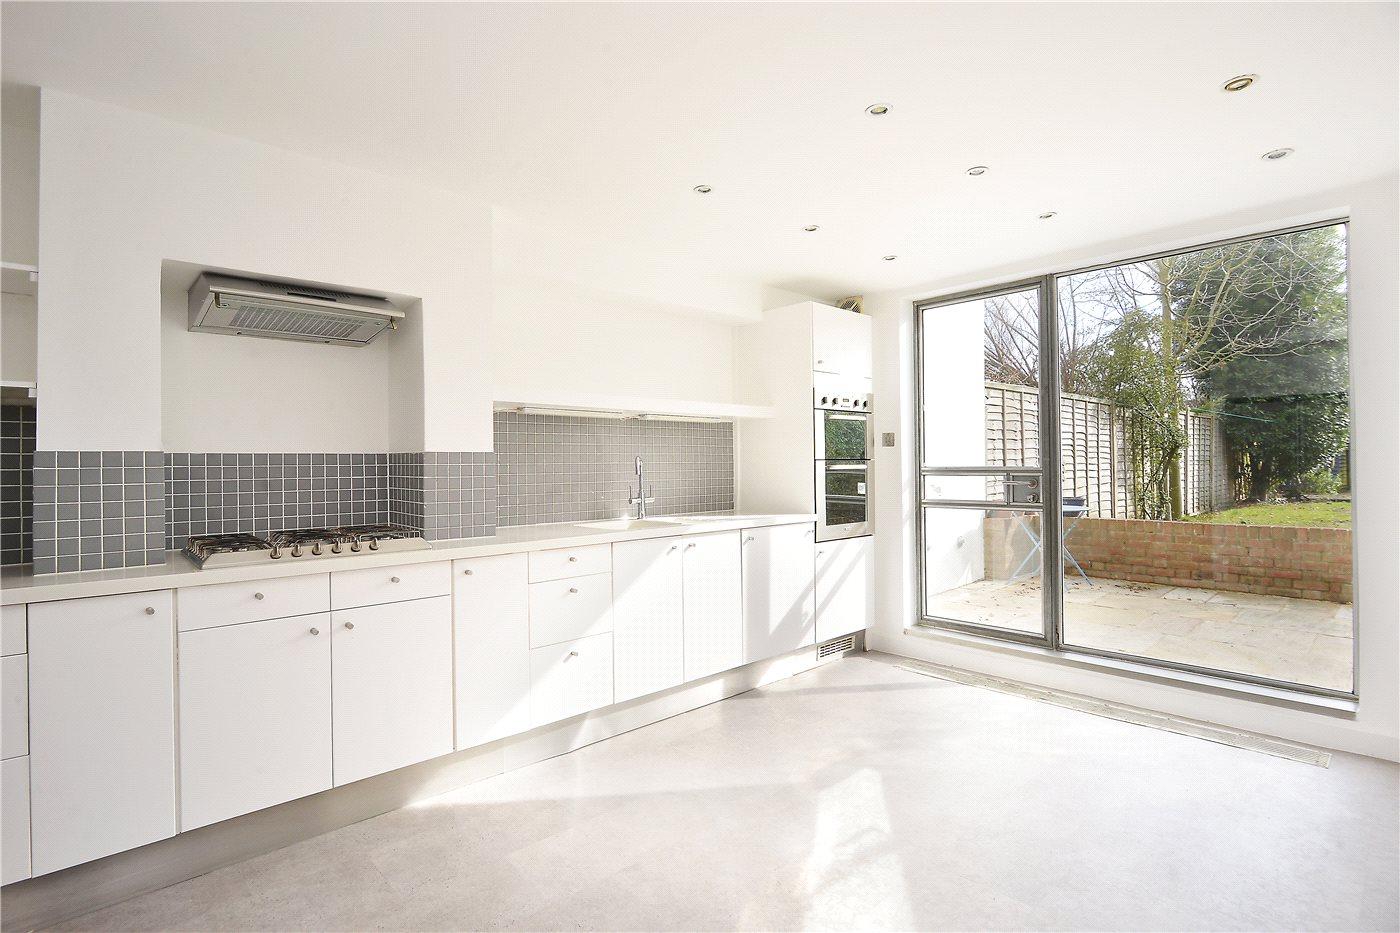 3 bedroom property for sale in Avondale Rise, Peckham Rye, SE15 ...